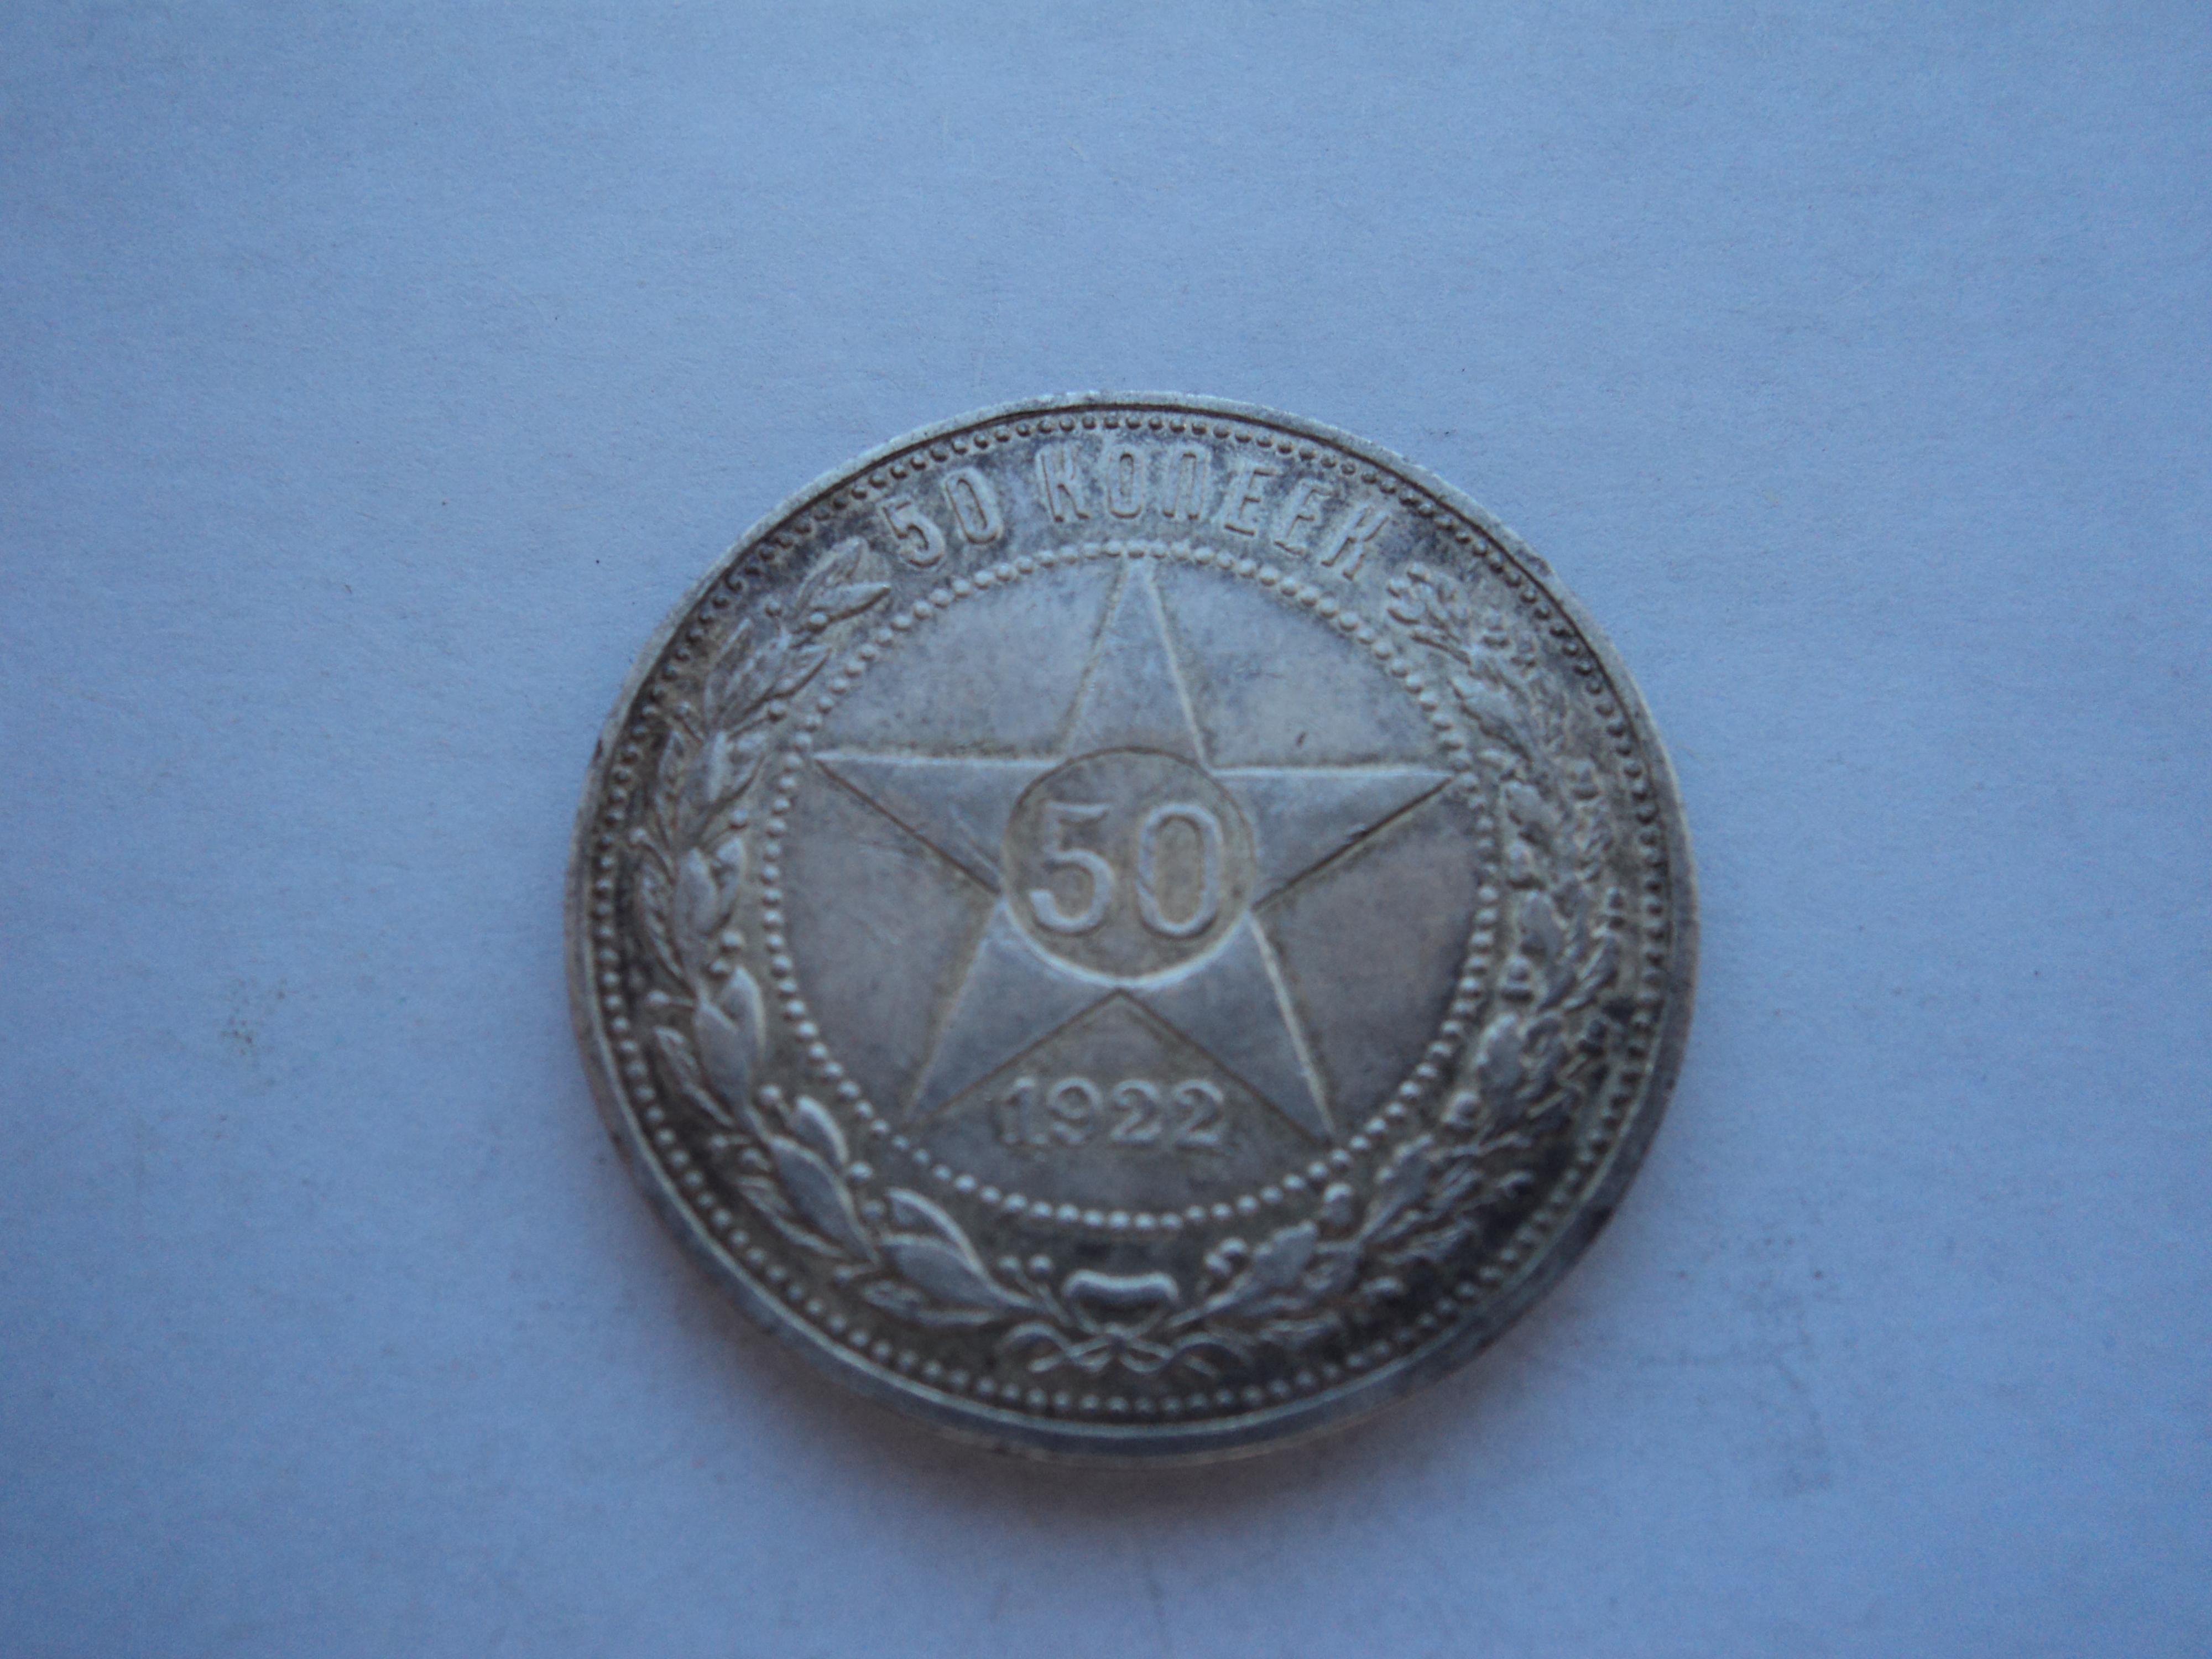 50 копеек 1921-1923 года